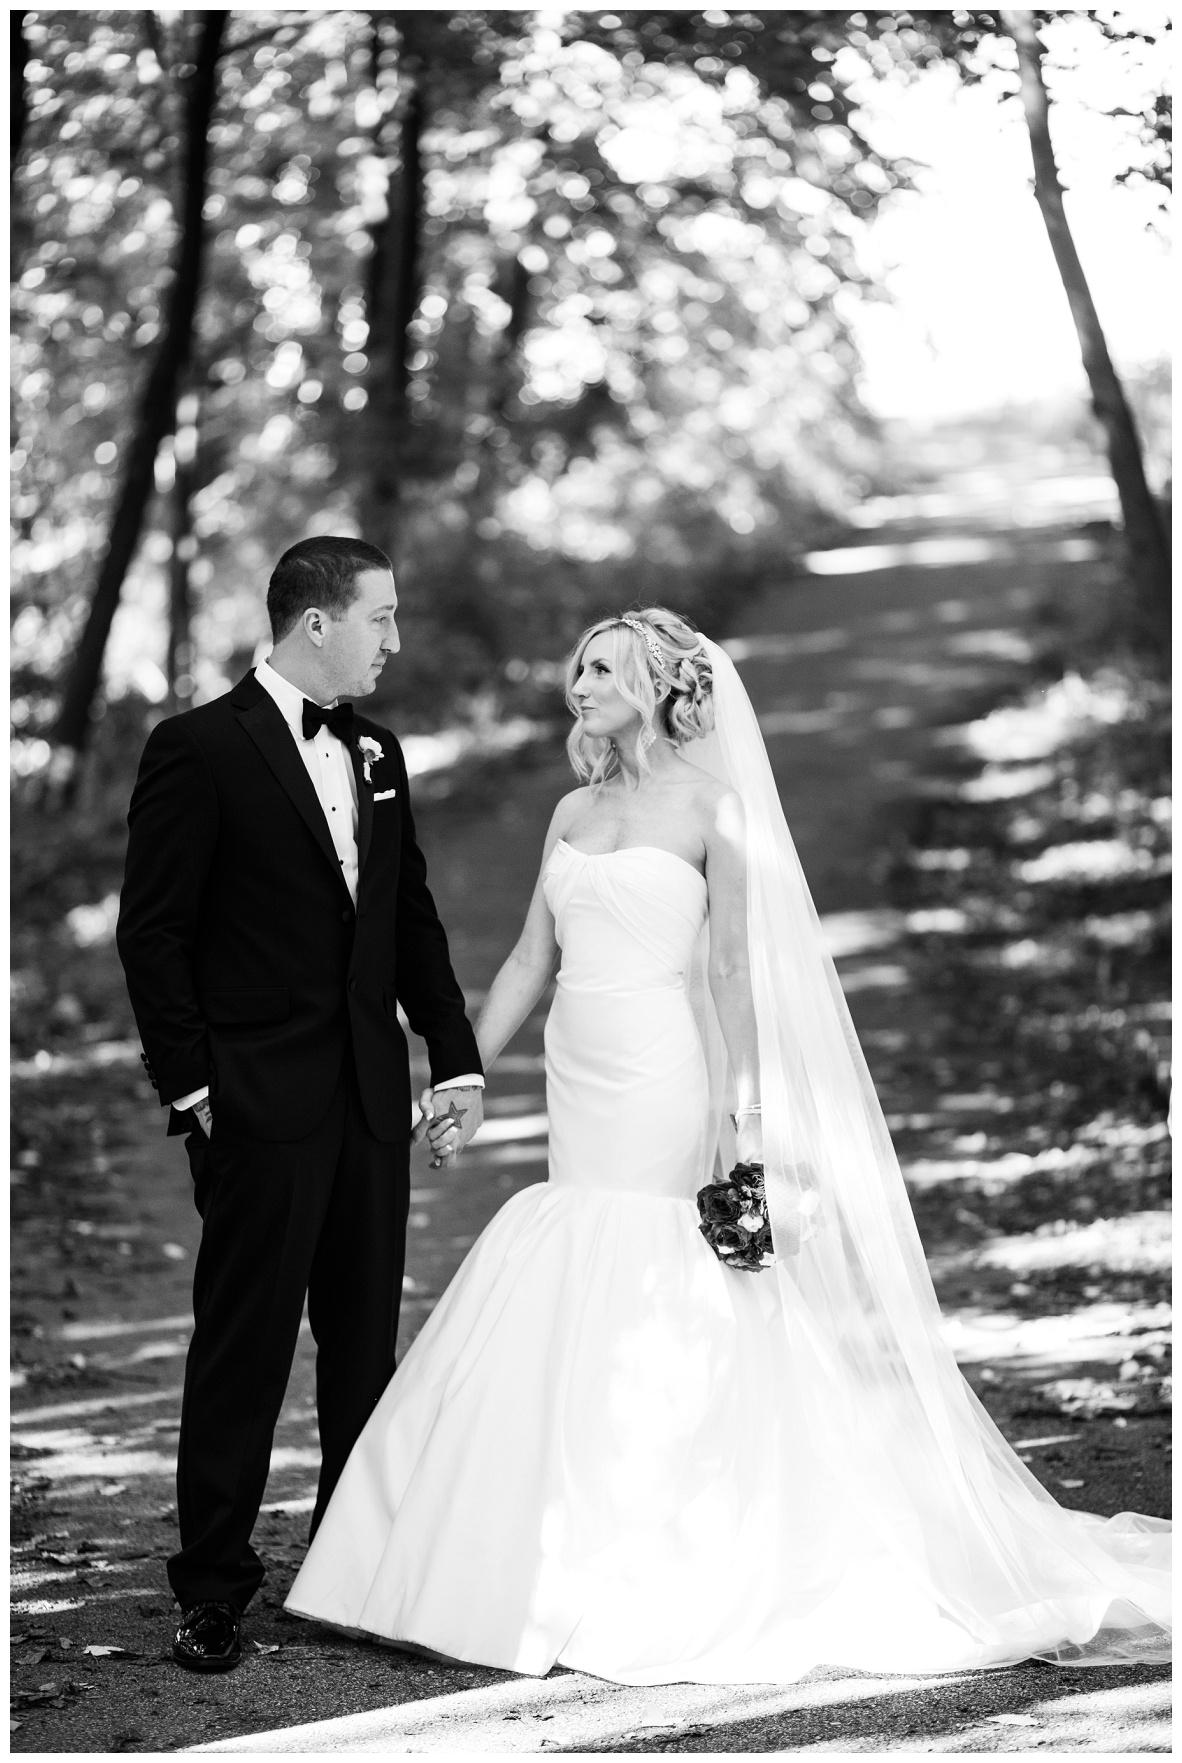 Mr. and Mrs. Papp_0028.jpg